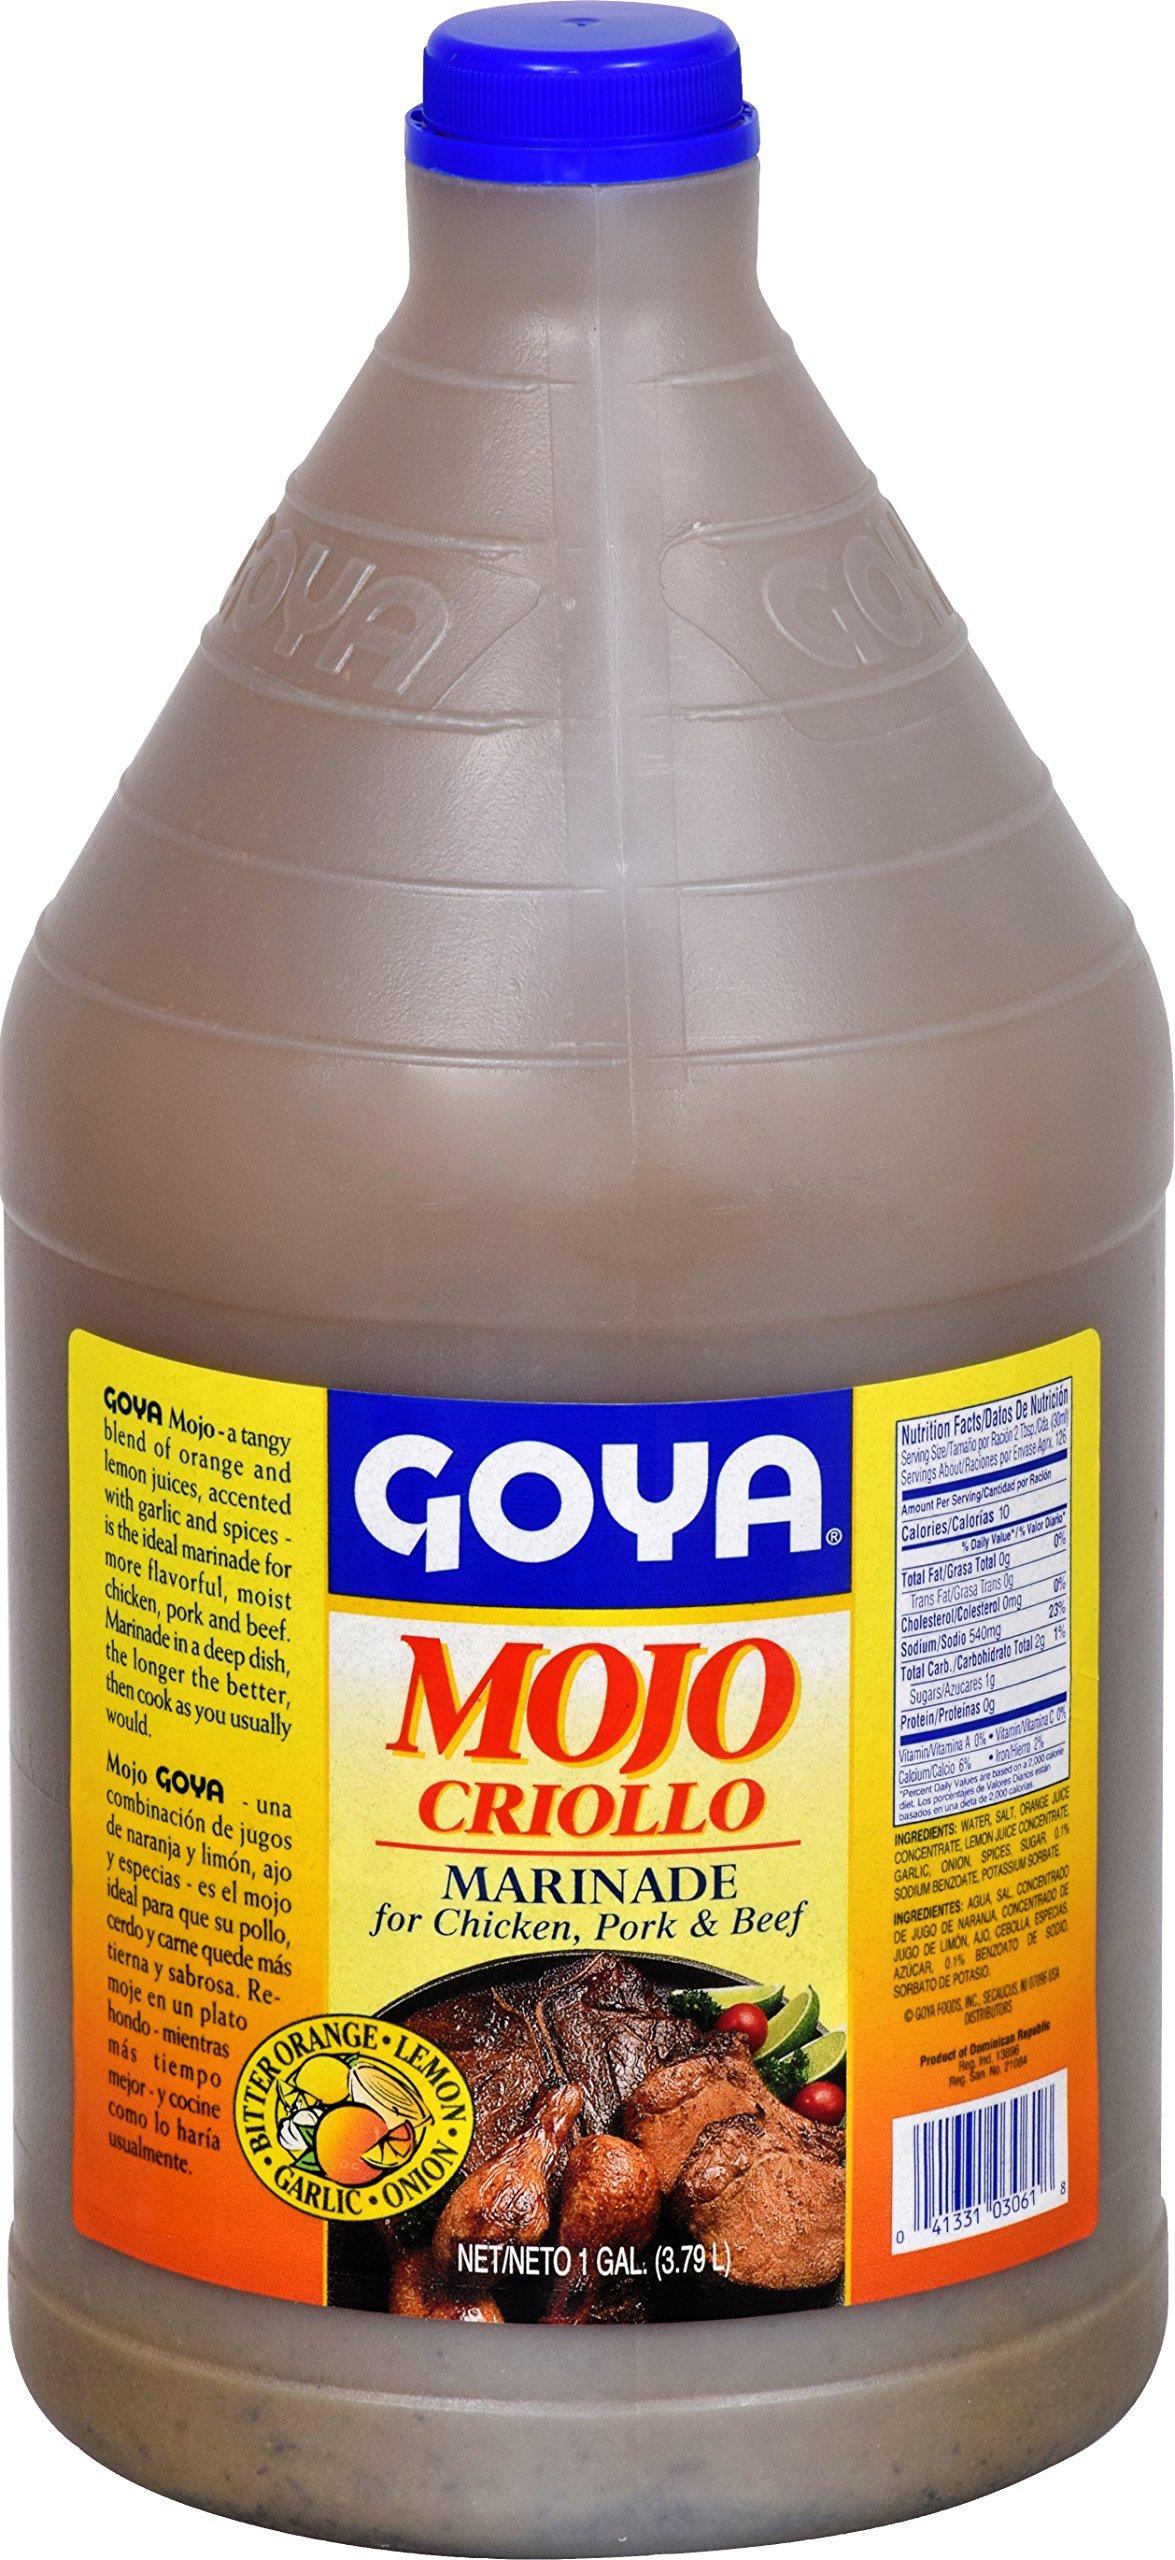 Goya Foods Mojo Criollo Marinade, 128 Ounce (Pack of 6) by Goya